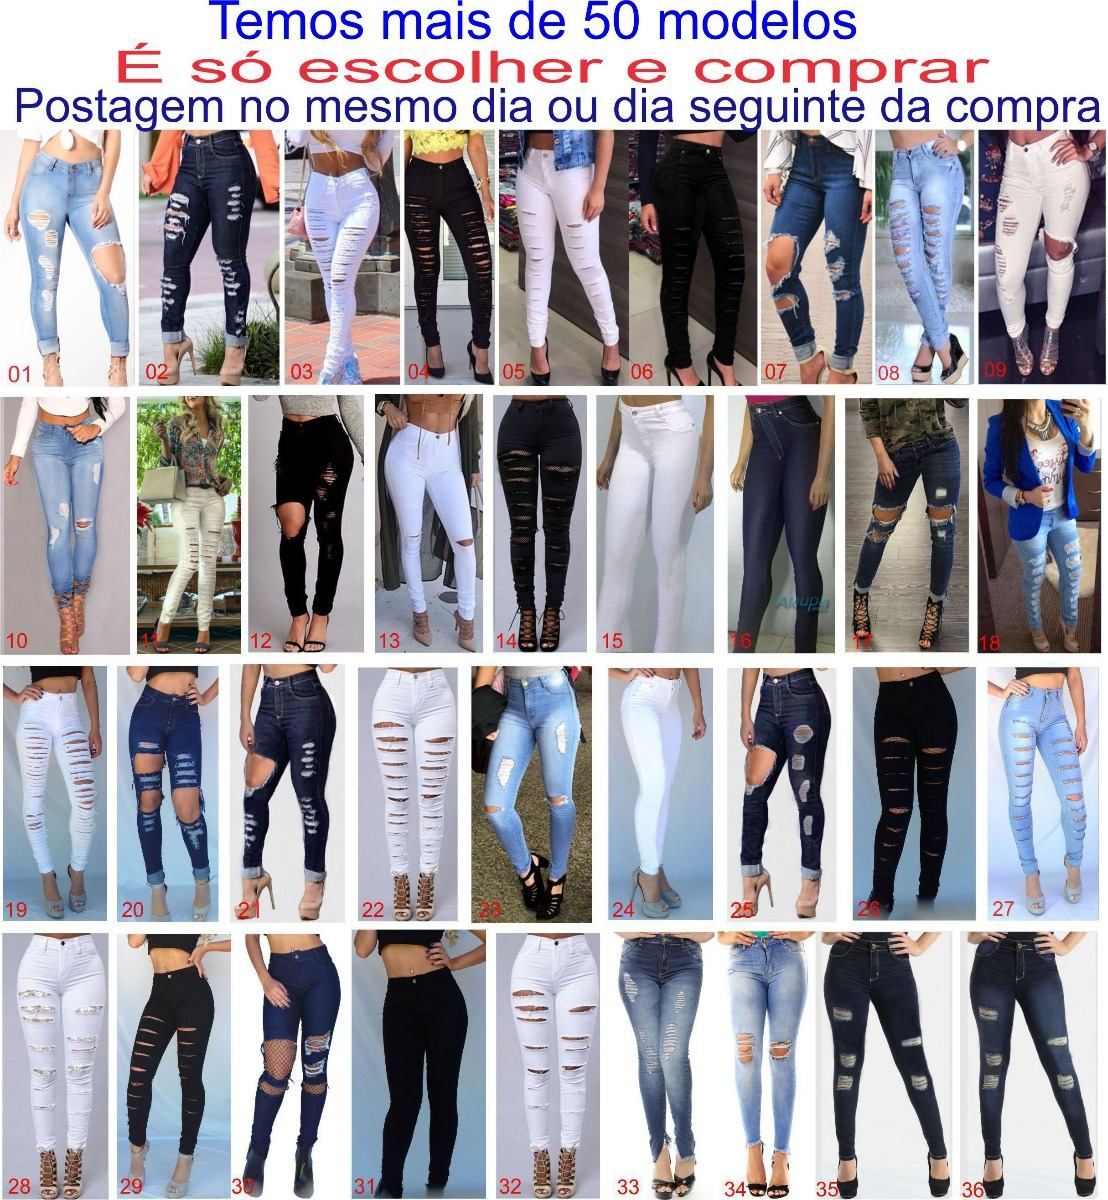 db17356b1 calça jeans feminina cintura alta rasgada joelho lycra dins. Carregando zoom .